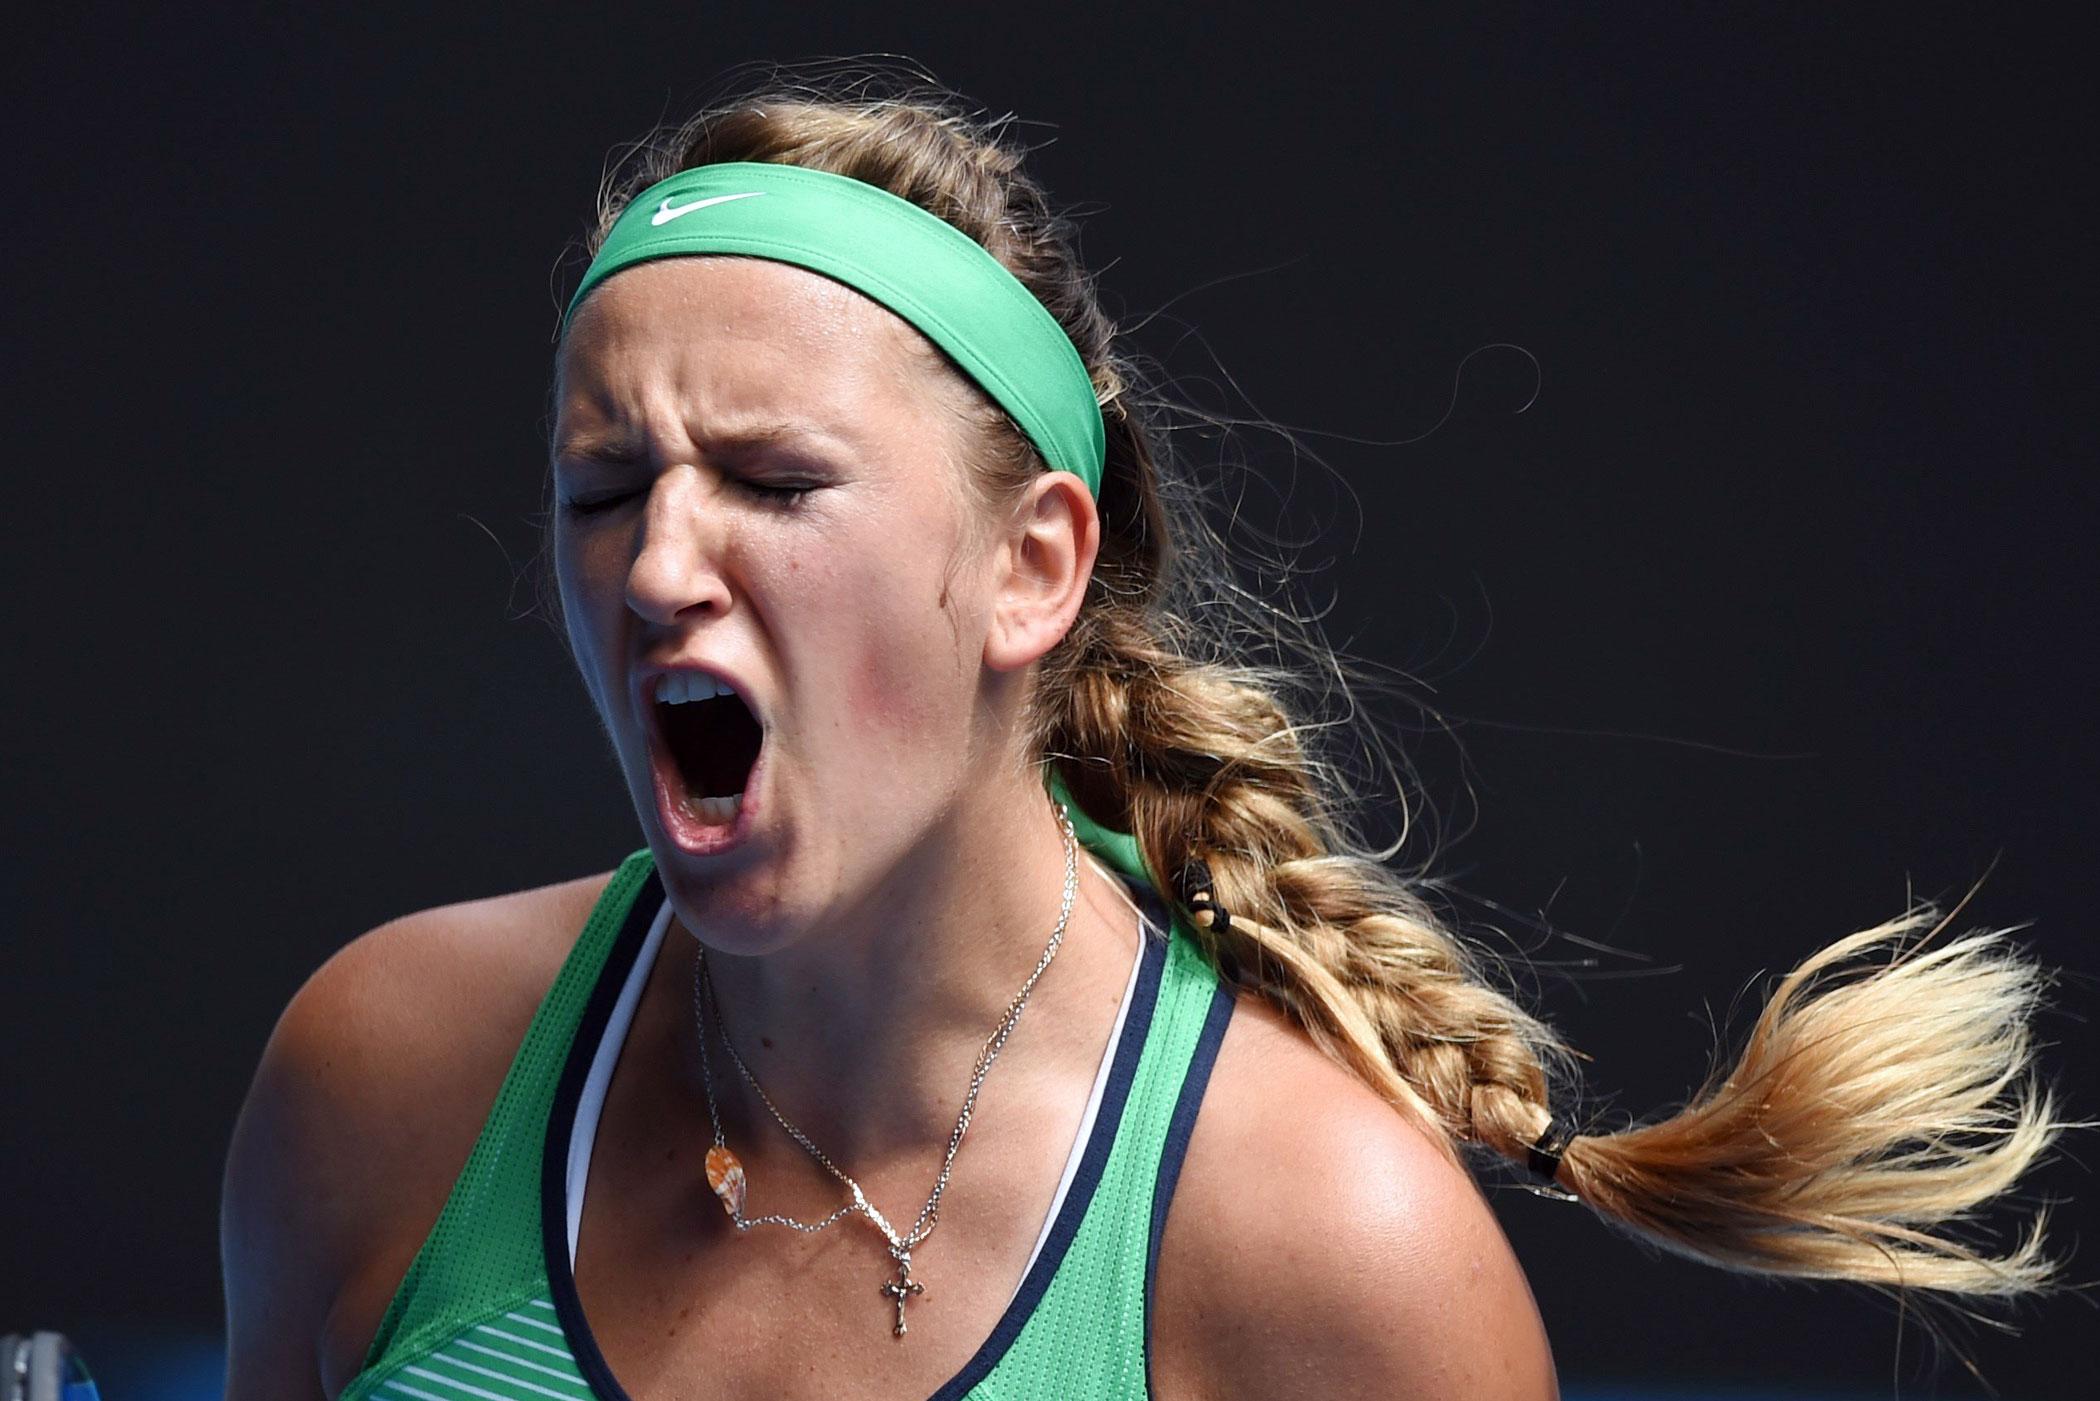 Belarus's Victoria Azarenka celebrates a point during her women's singles match against Germany's Angelique Kerber on Jan. 27, 2016.